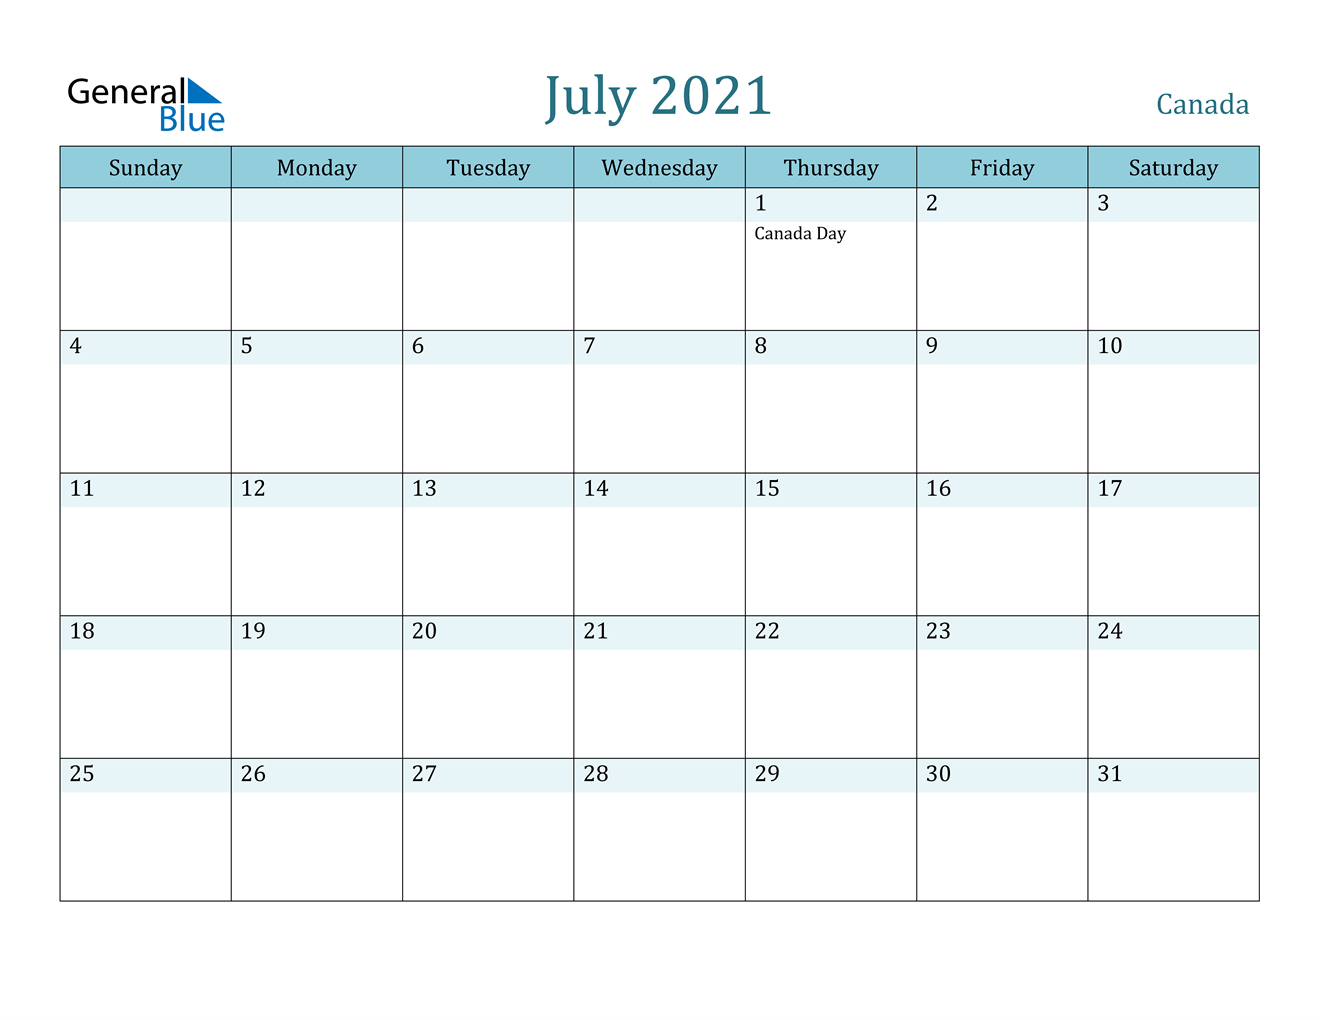 Canada July 2021 Calendar With Holidays